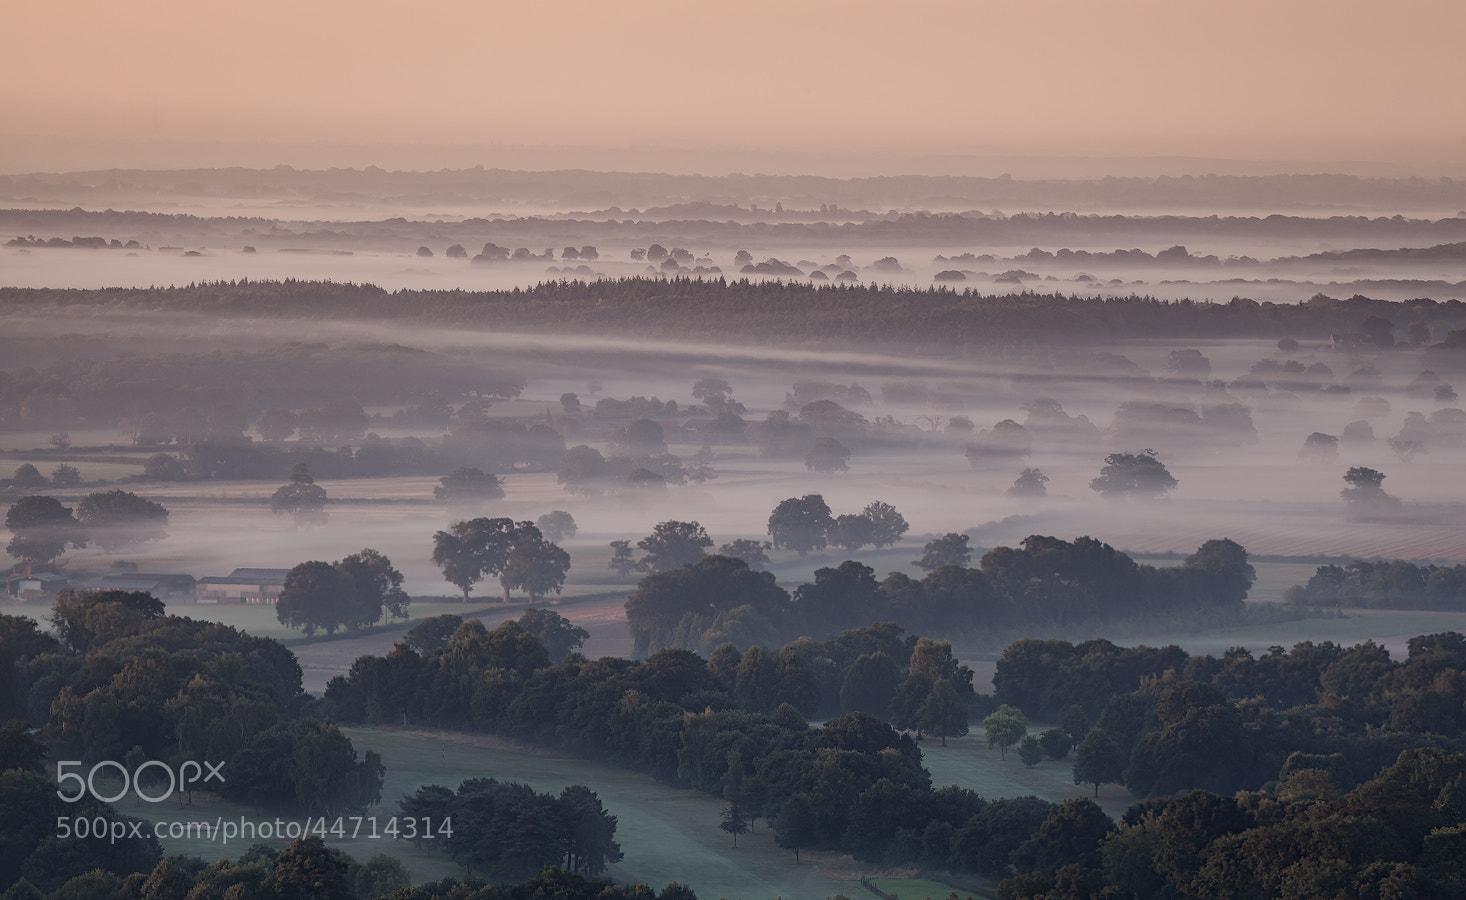 Photograph A Misty Start by Daniel Hannabuss on 500px